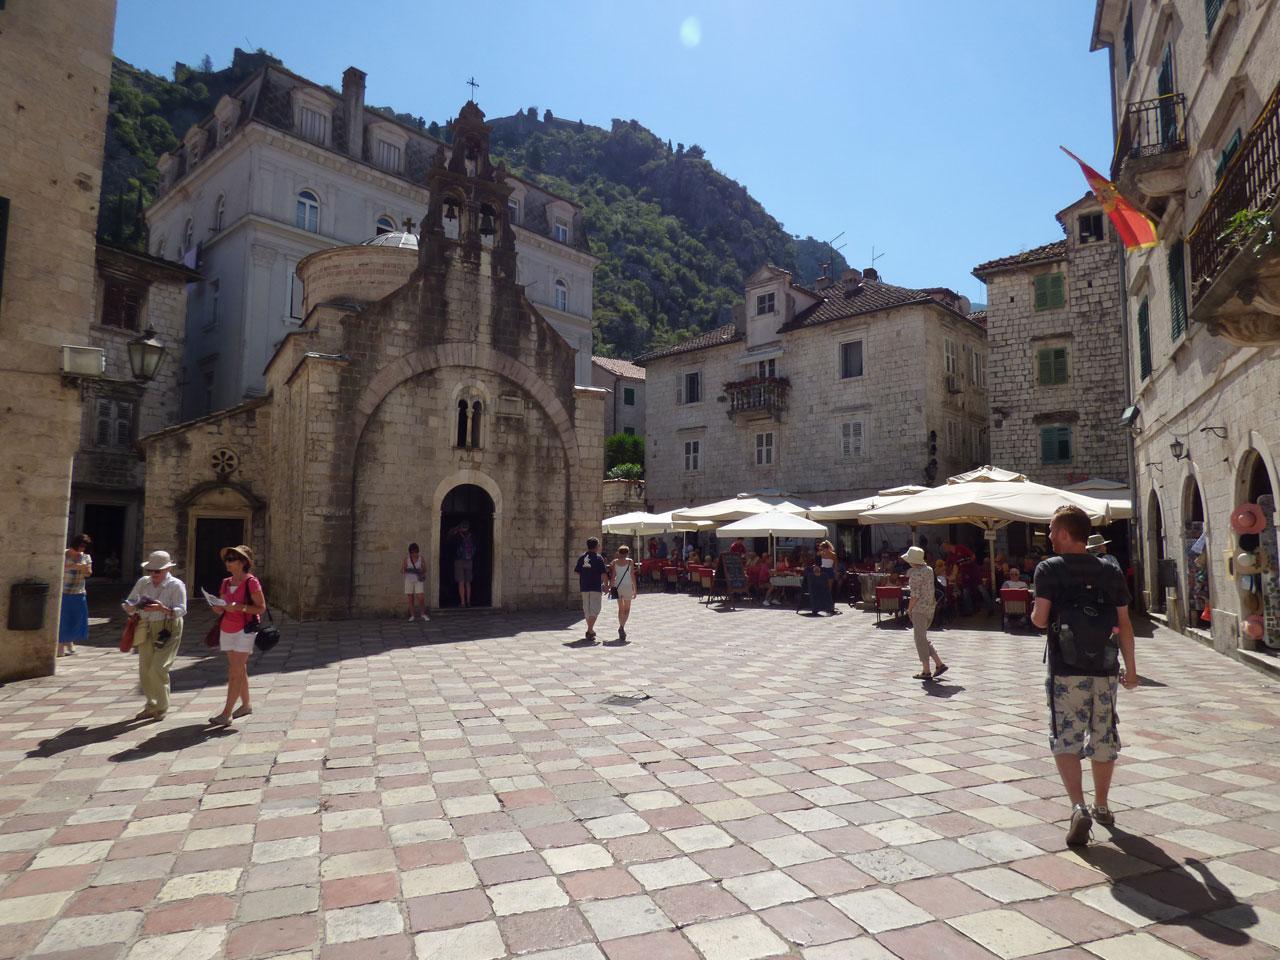 St Luke's Square, Kotor, Montenegro